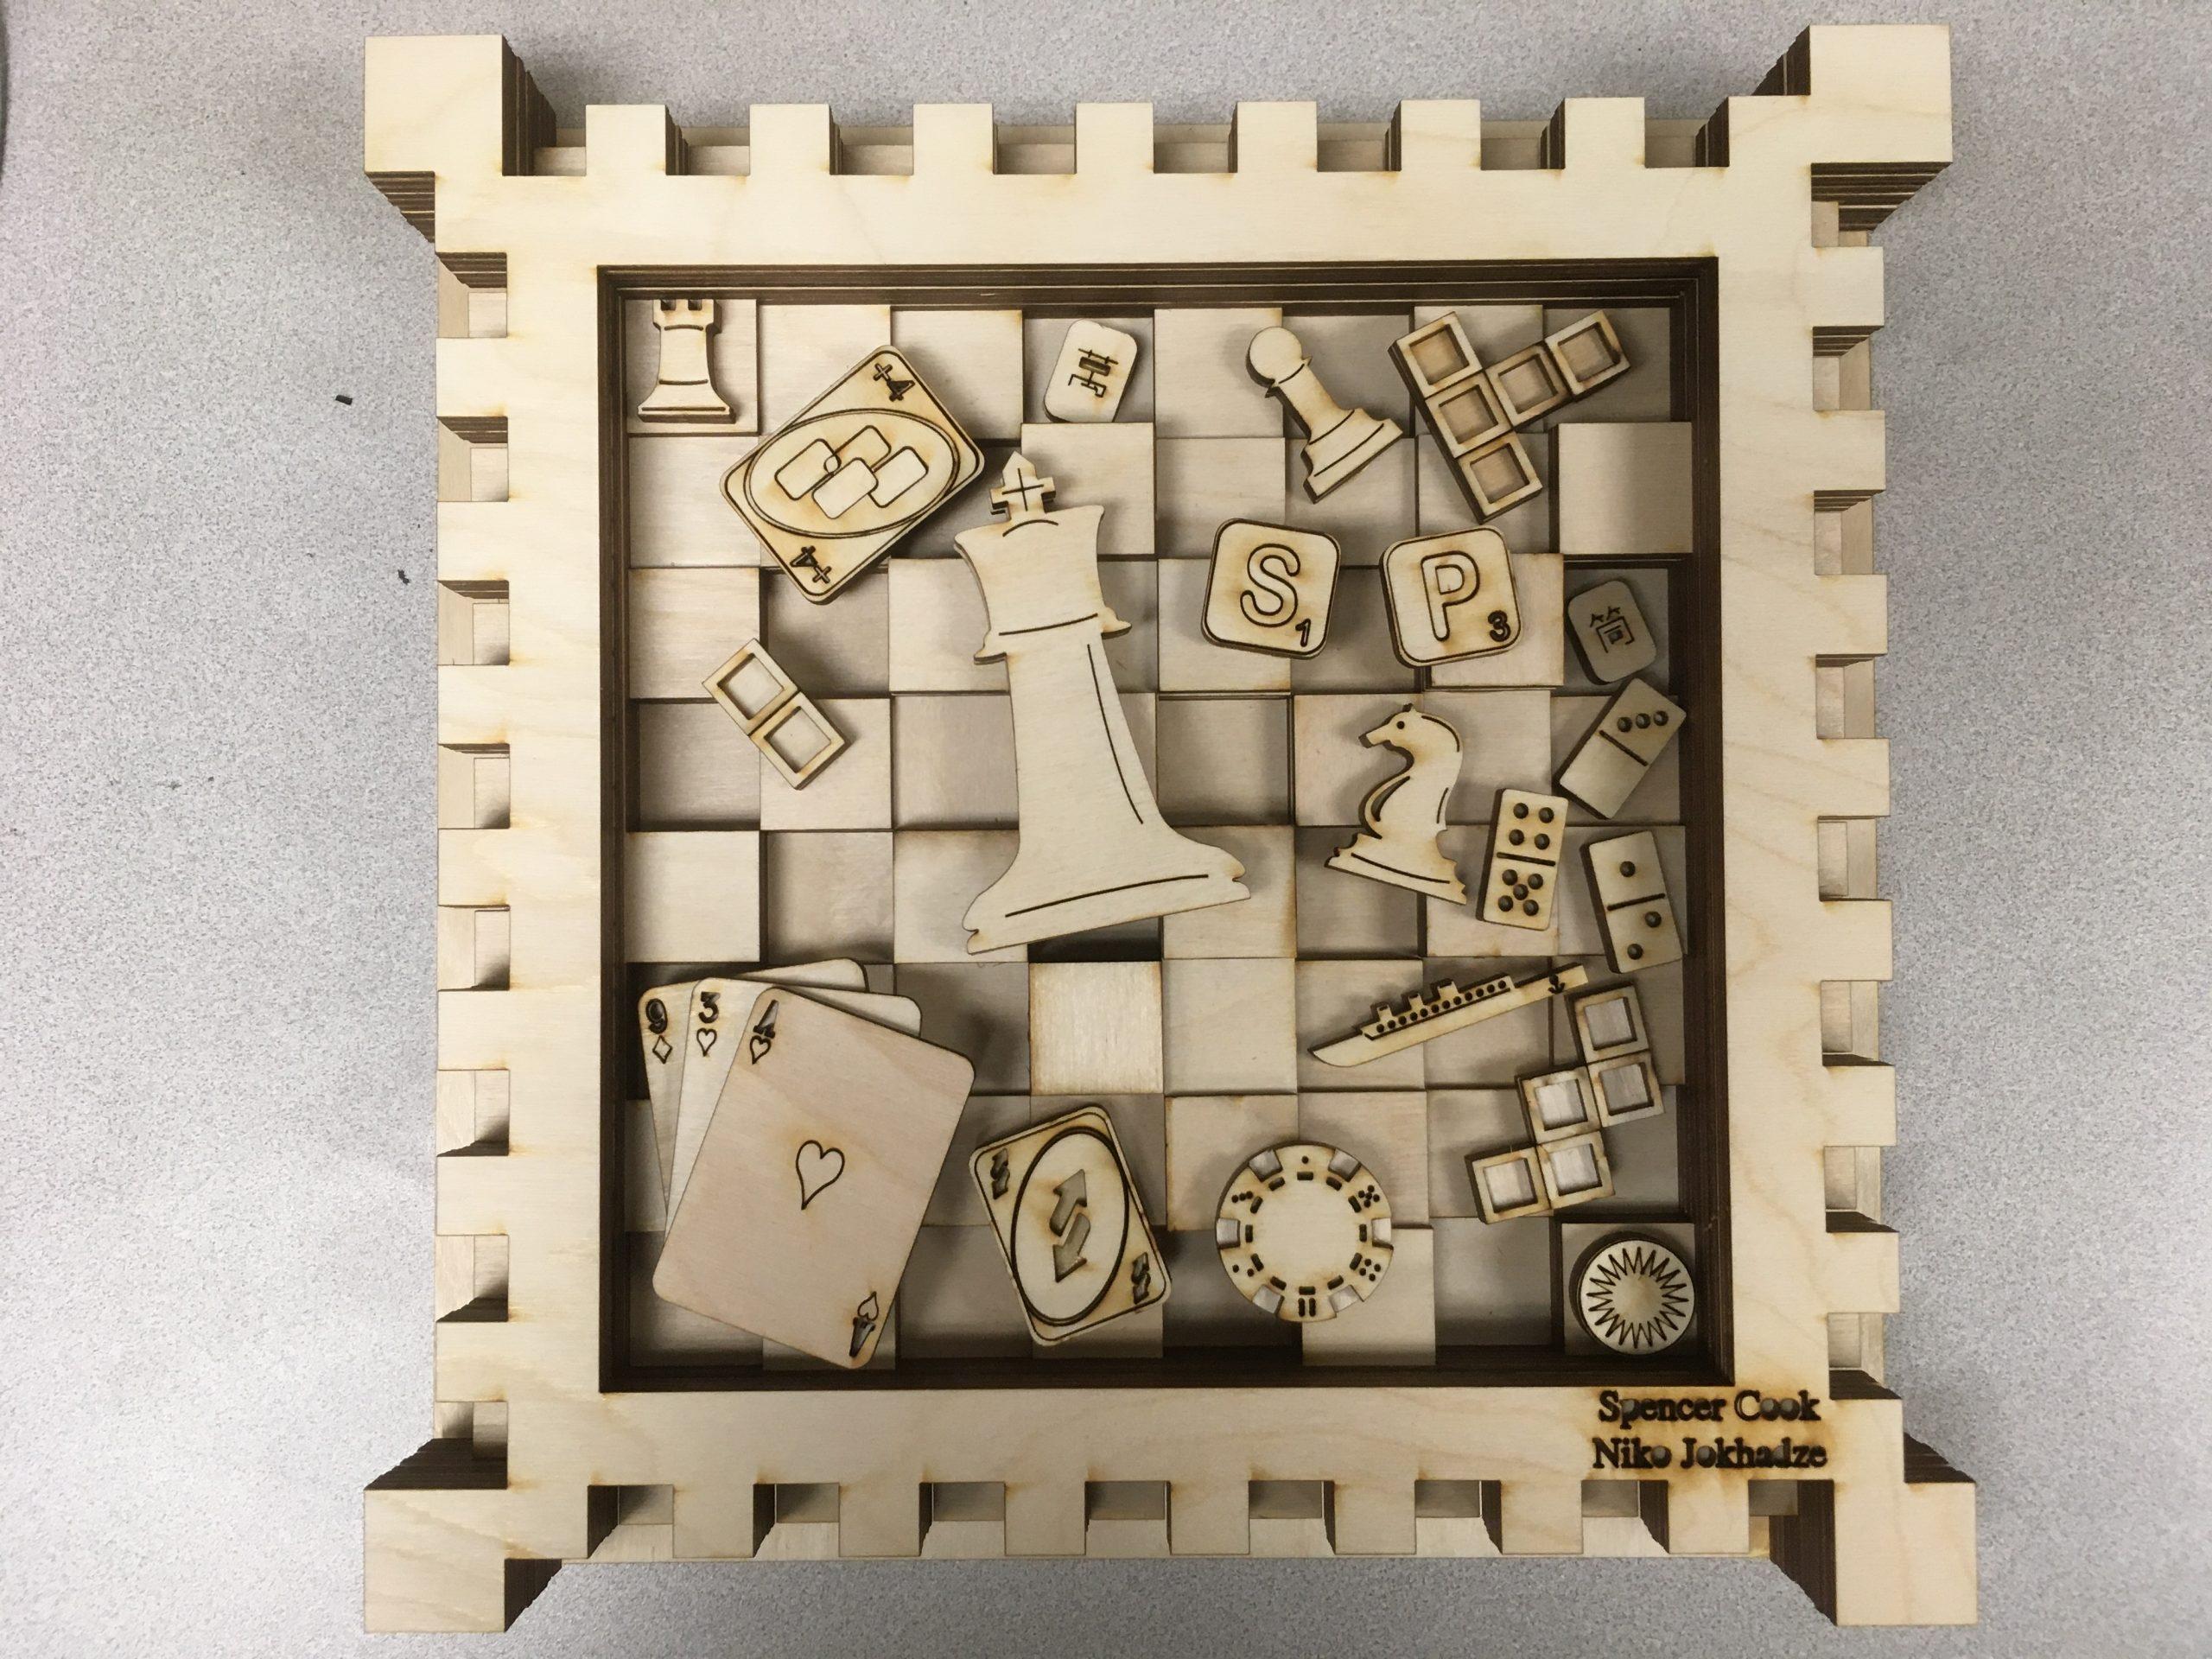 Image of final 3D wood art.